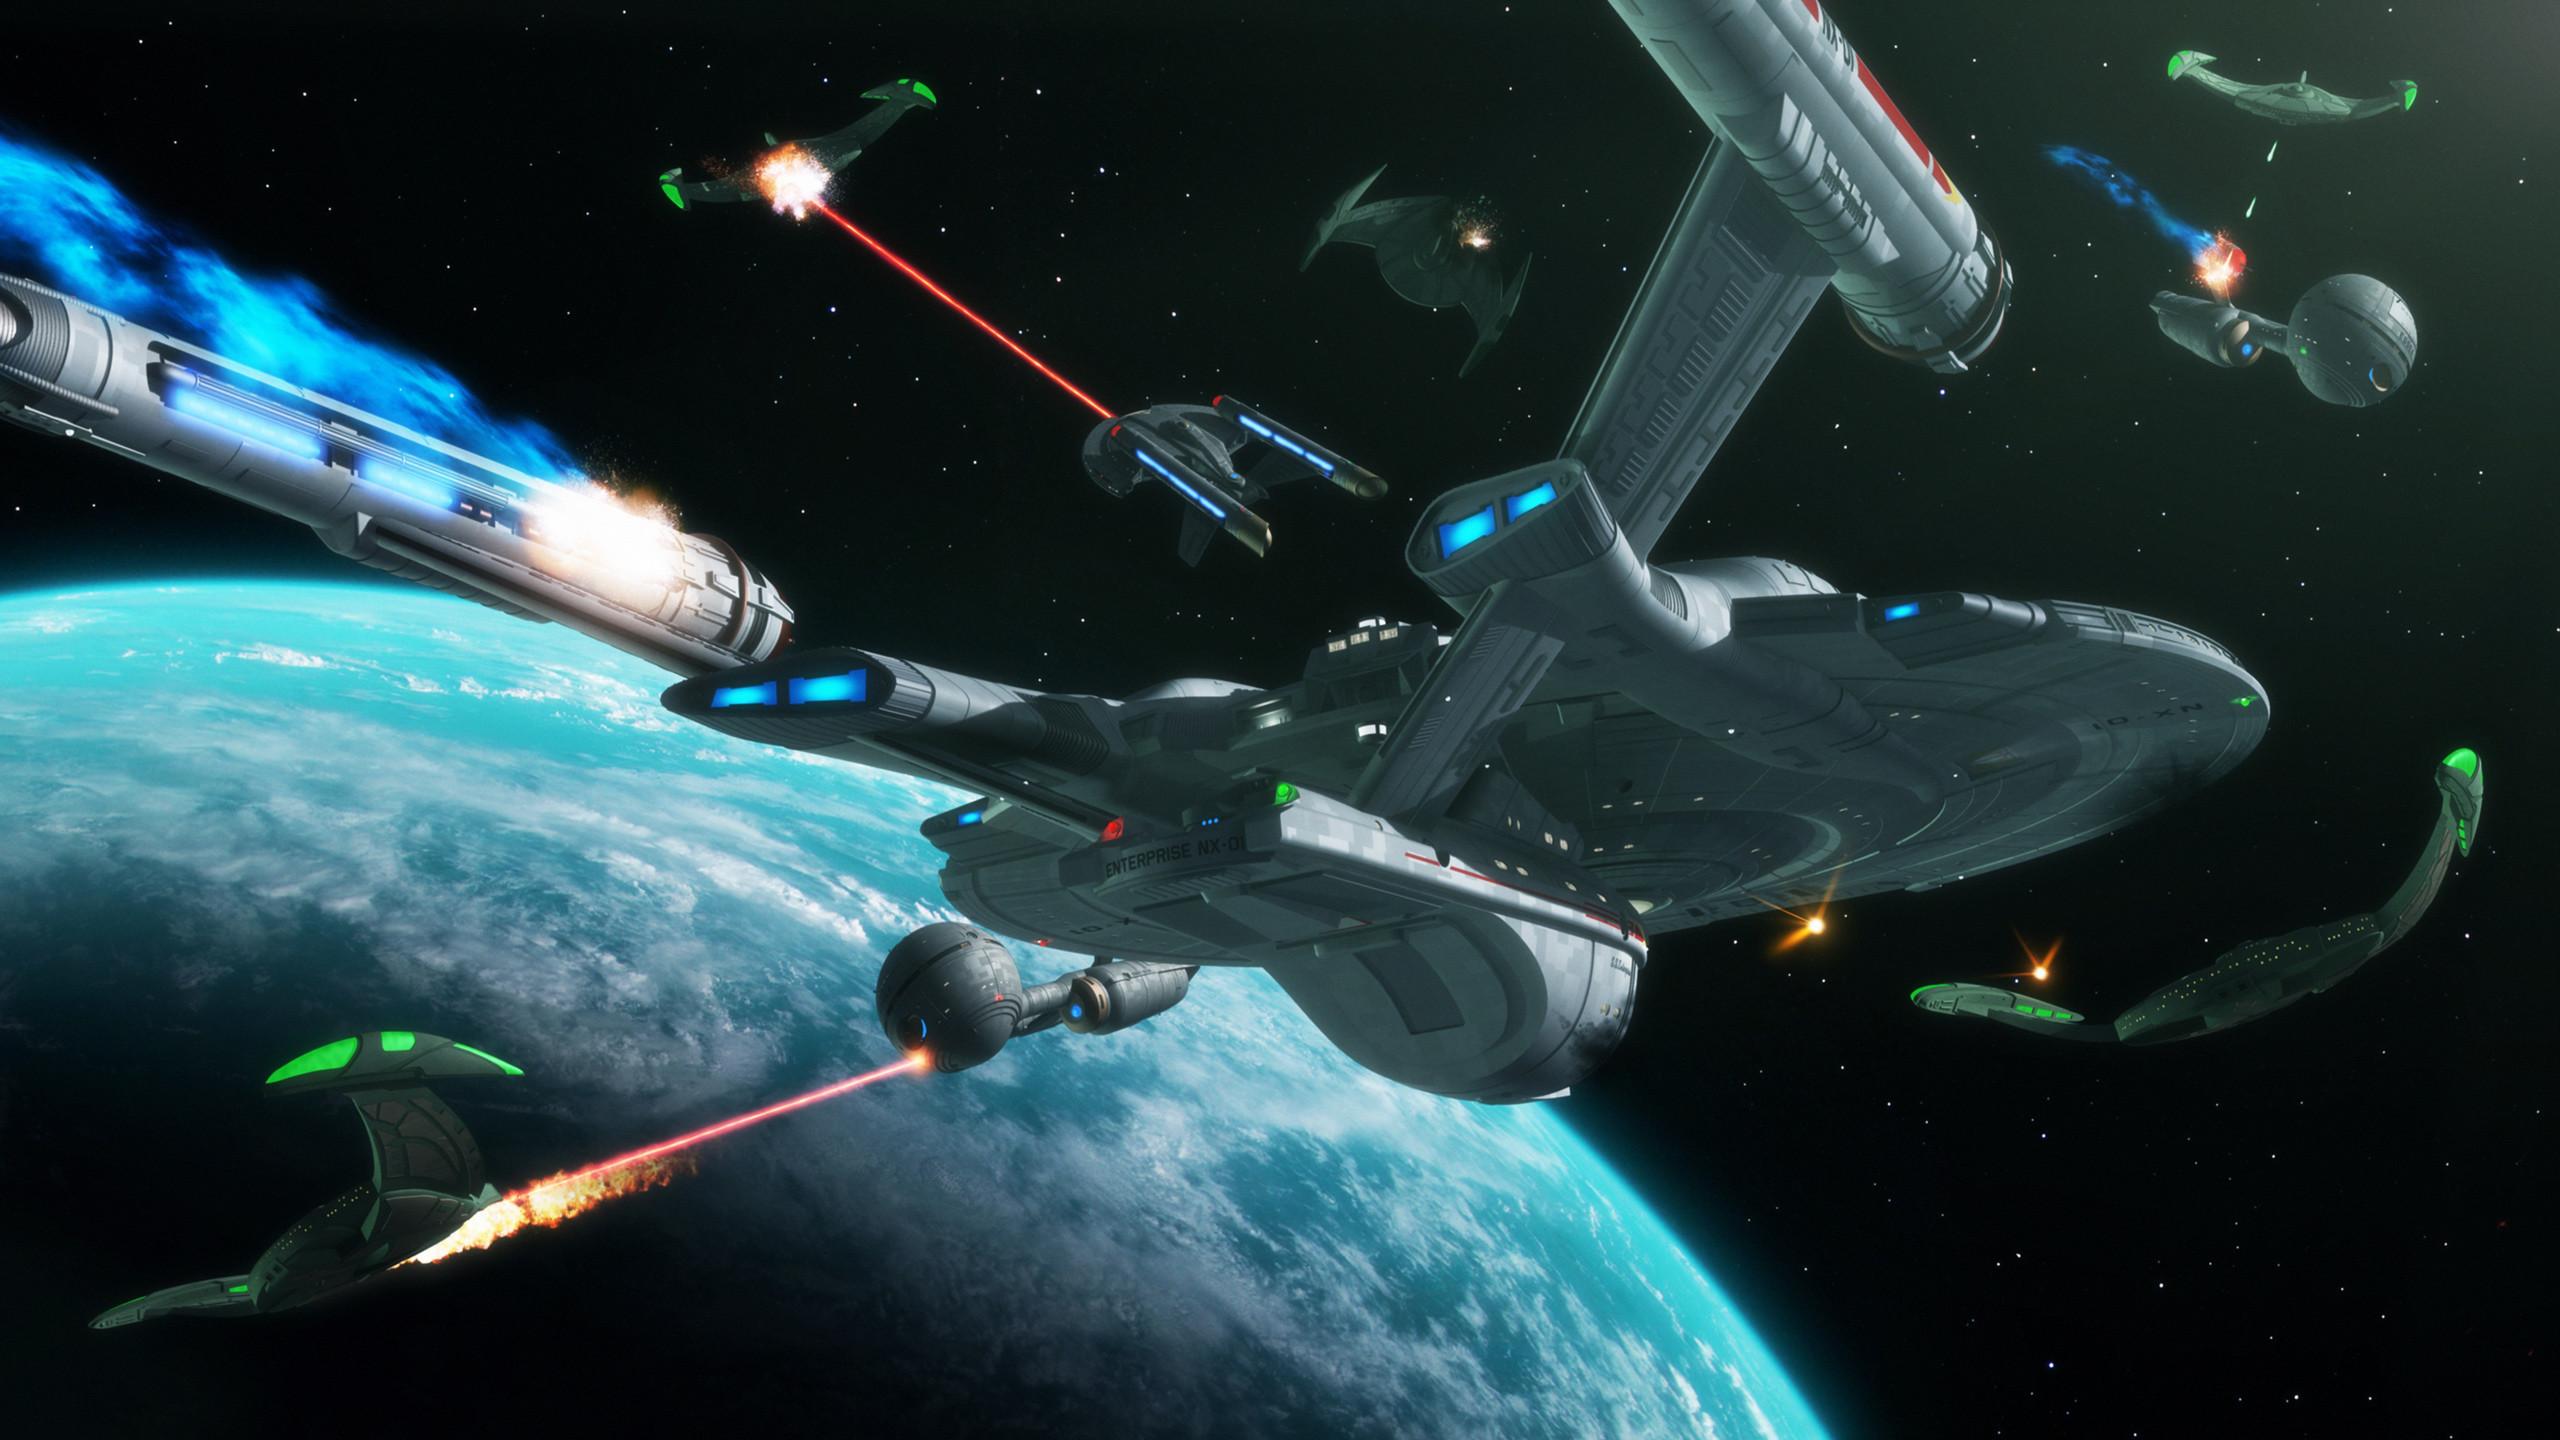 Star Trek Ship Wallpapers: Star Trek Wallpaper (76+ Images